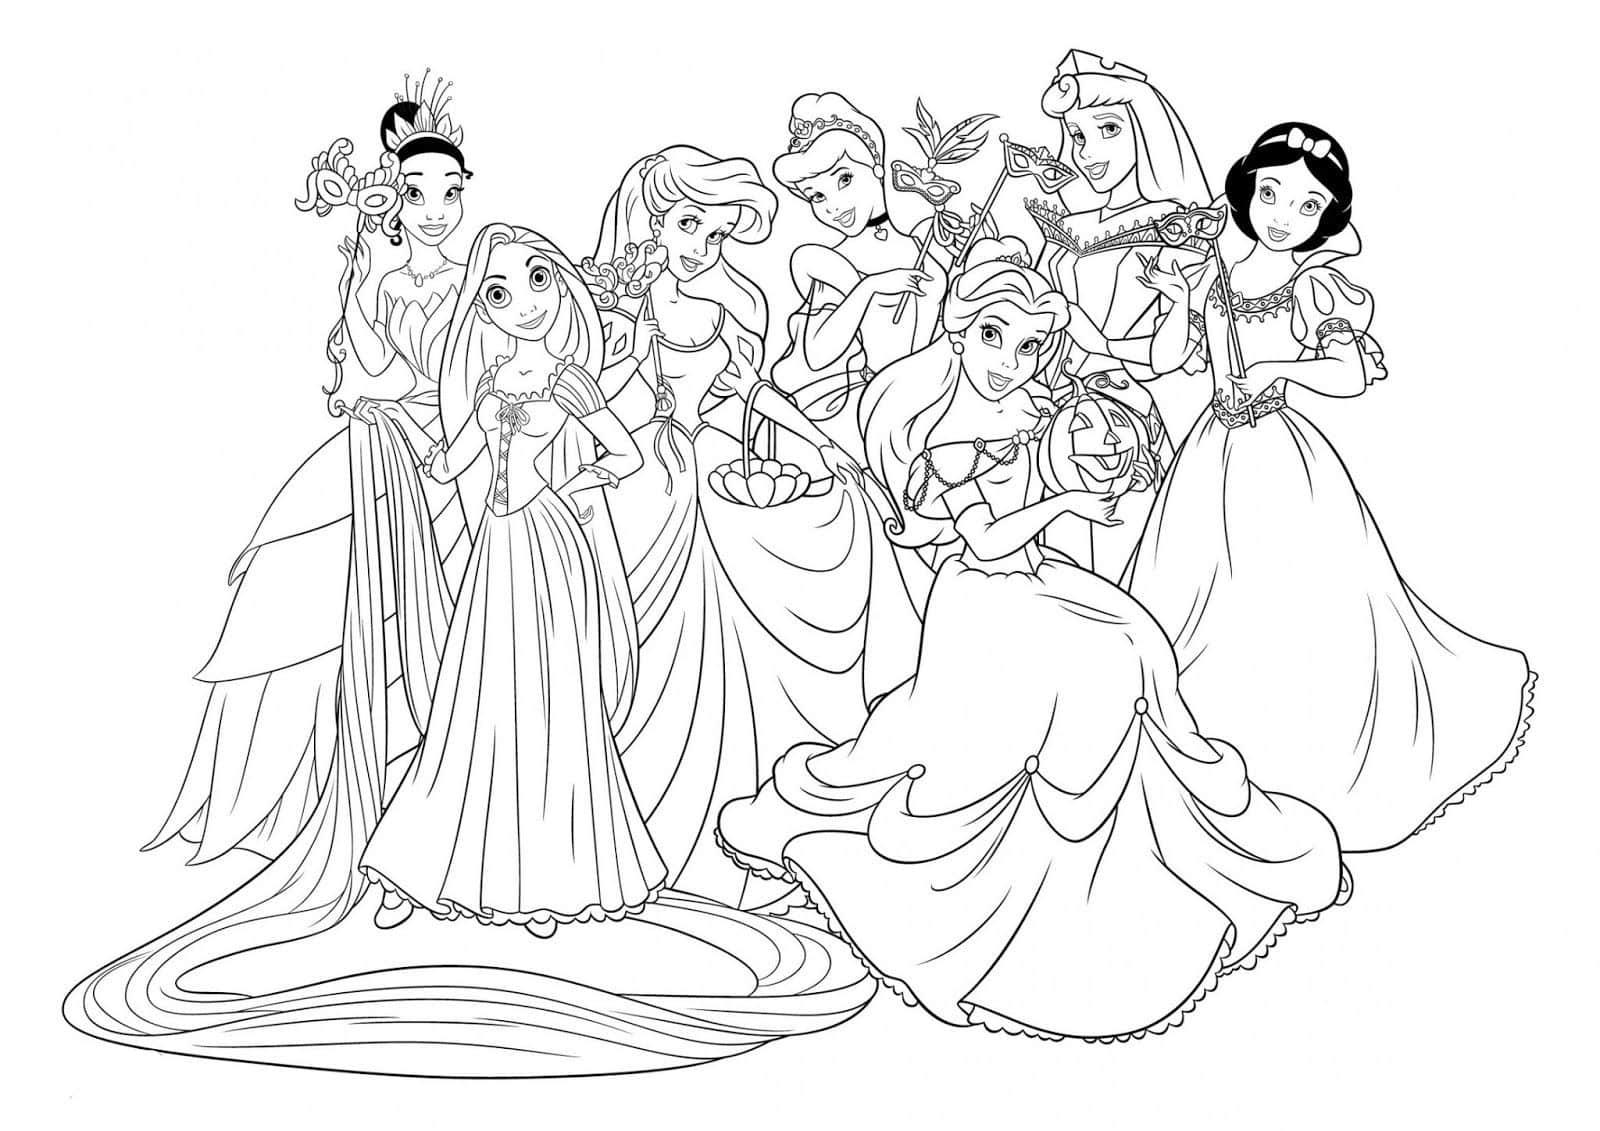 Coloriage A Imprimer Princesse Disney - ma-eyes